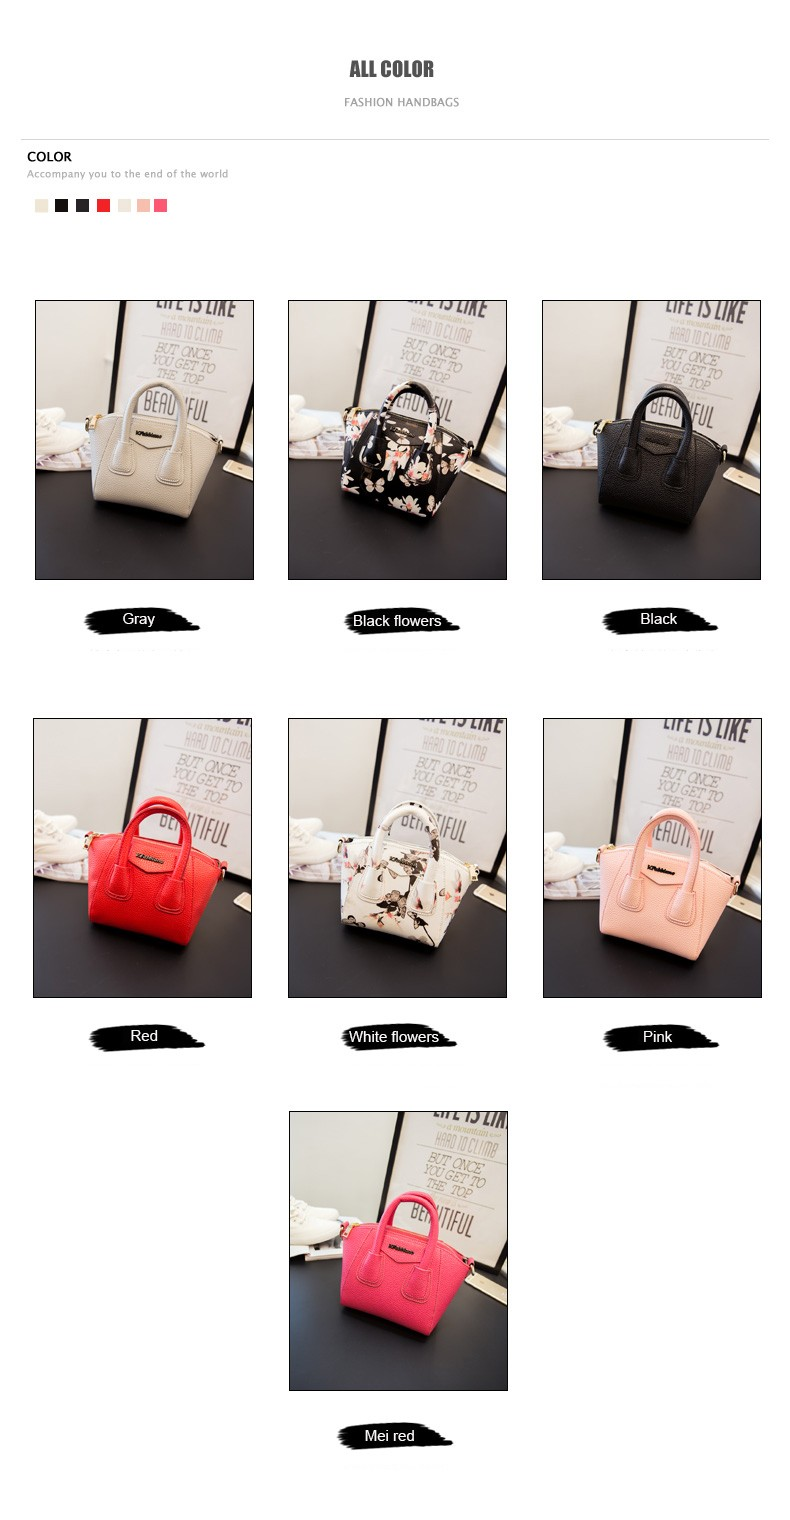 Stylish Shell Bag Hand Bag Women Fashion Elegant Handbag Ladies Embossed PU Leather Shoulder Bag Female Simple Crossbody Bag